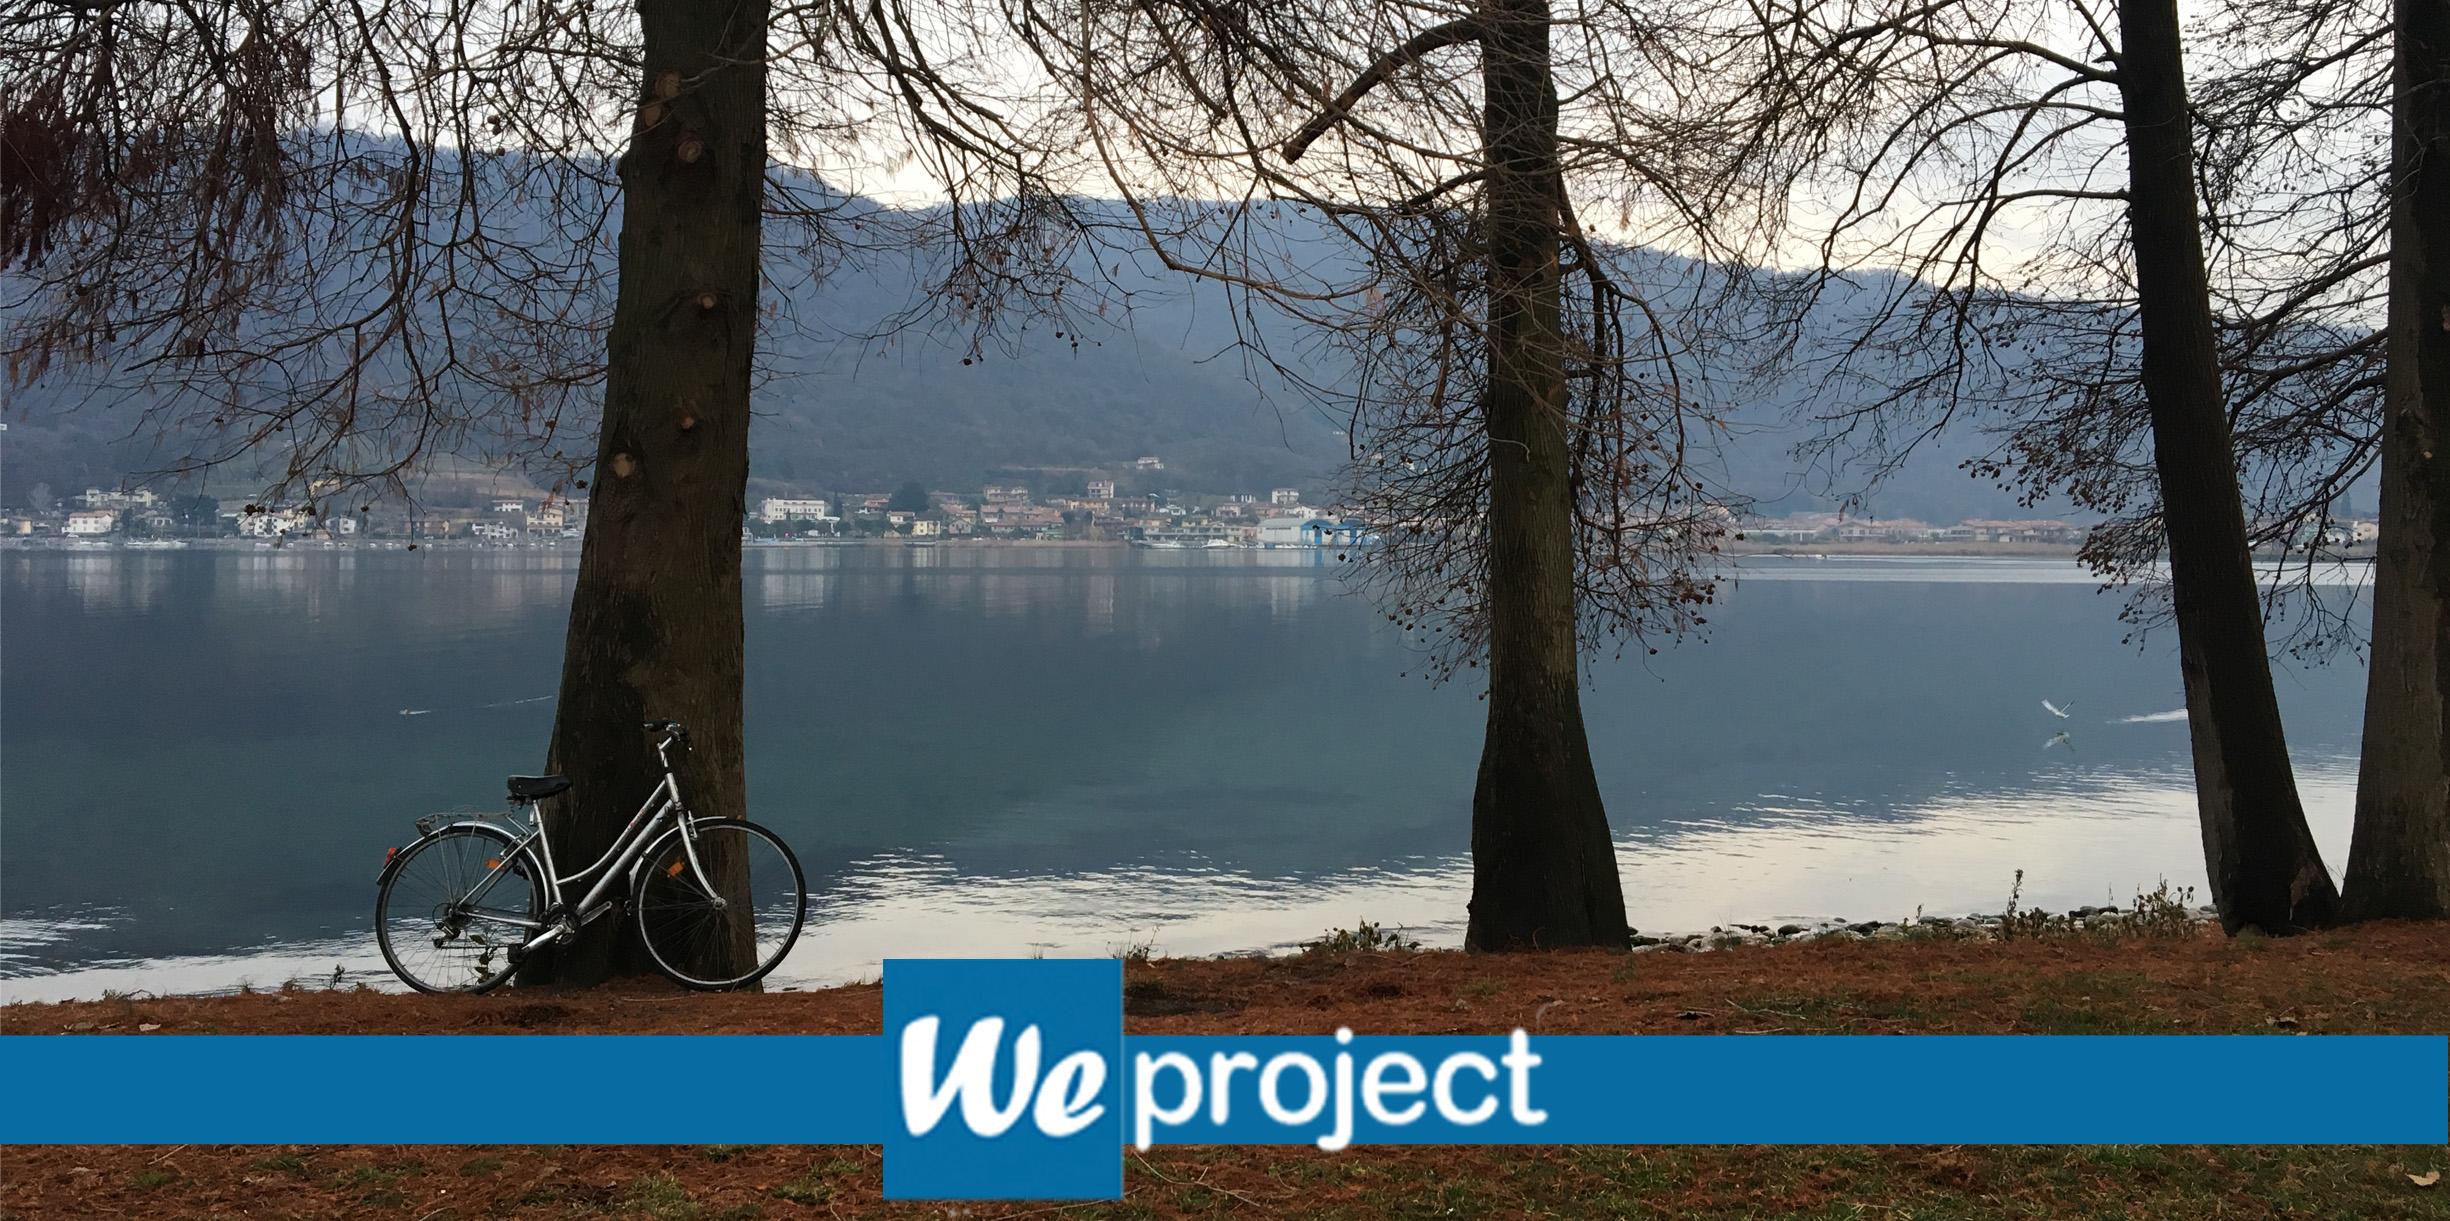 Bando cicloturismo della Lombardia